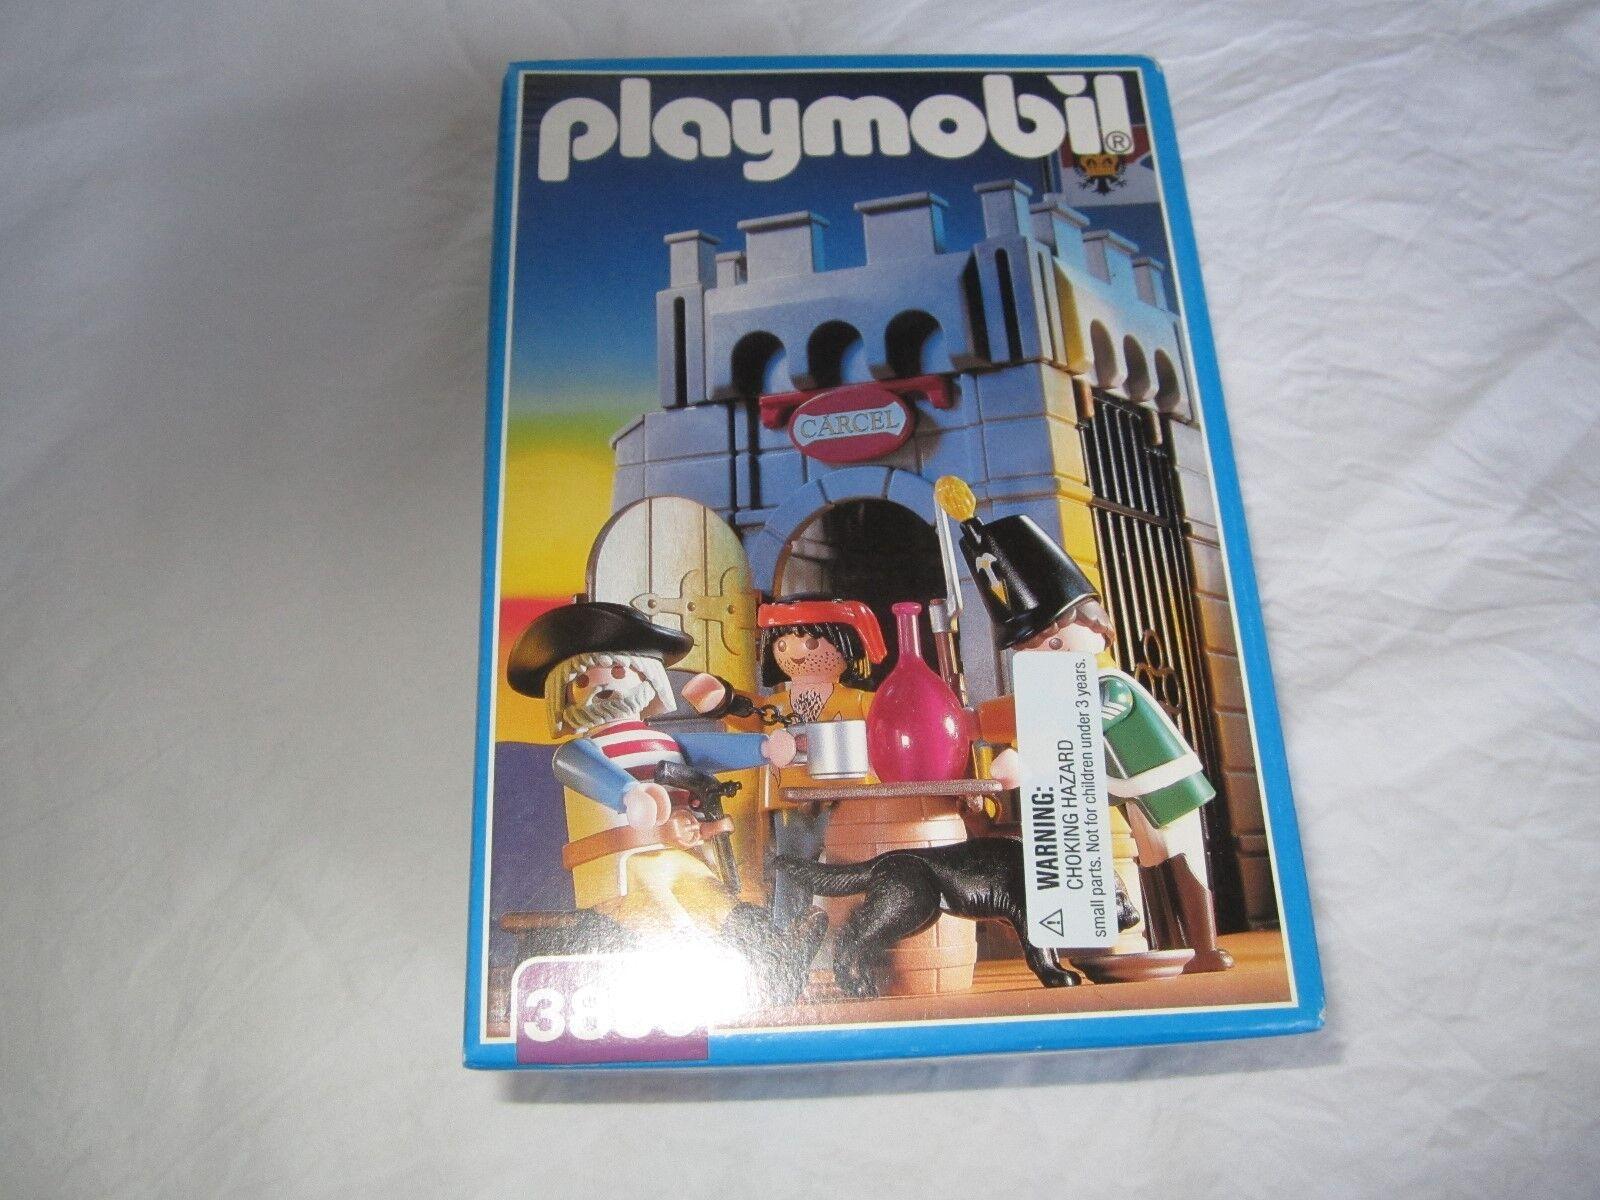 Playmobil piraten soldaten gevangenis jail prison 3859 3112 9998 3113 3054 new